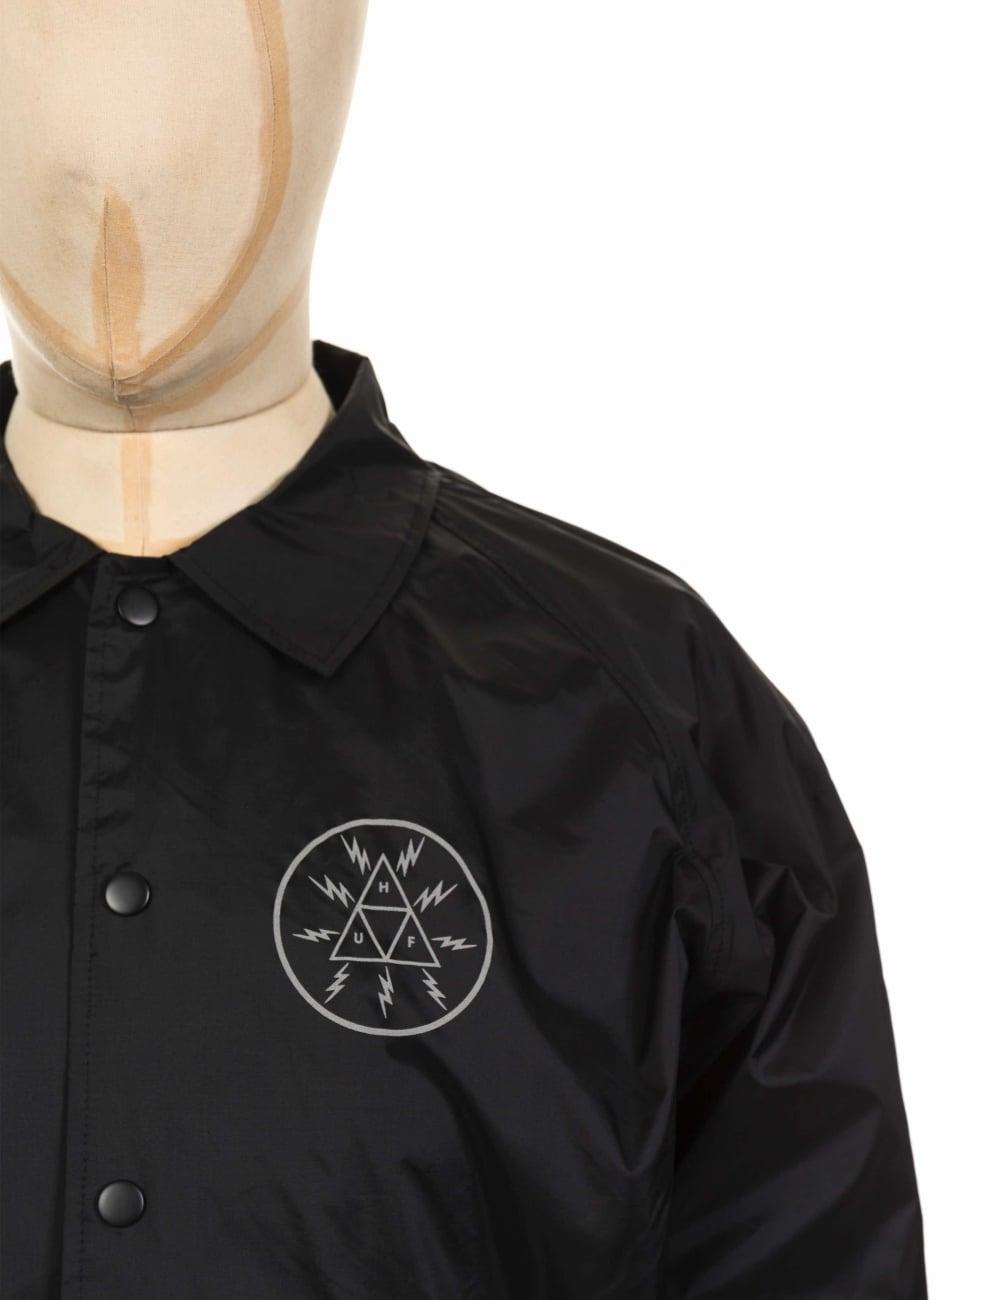 Huf Voltage Coach Jacket Black Clothing From Fat Buddha Store Uk